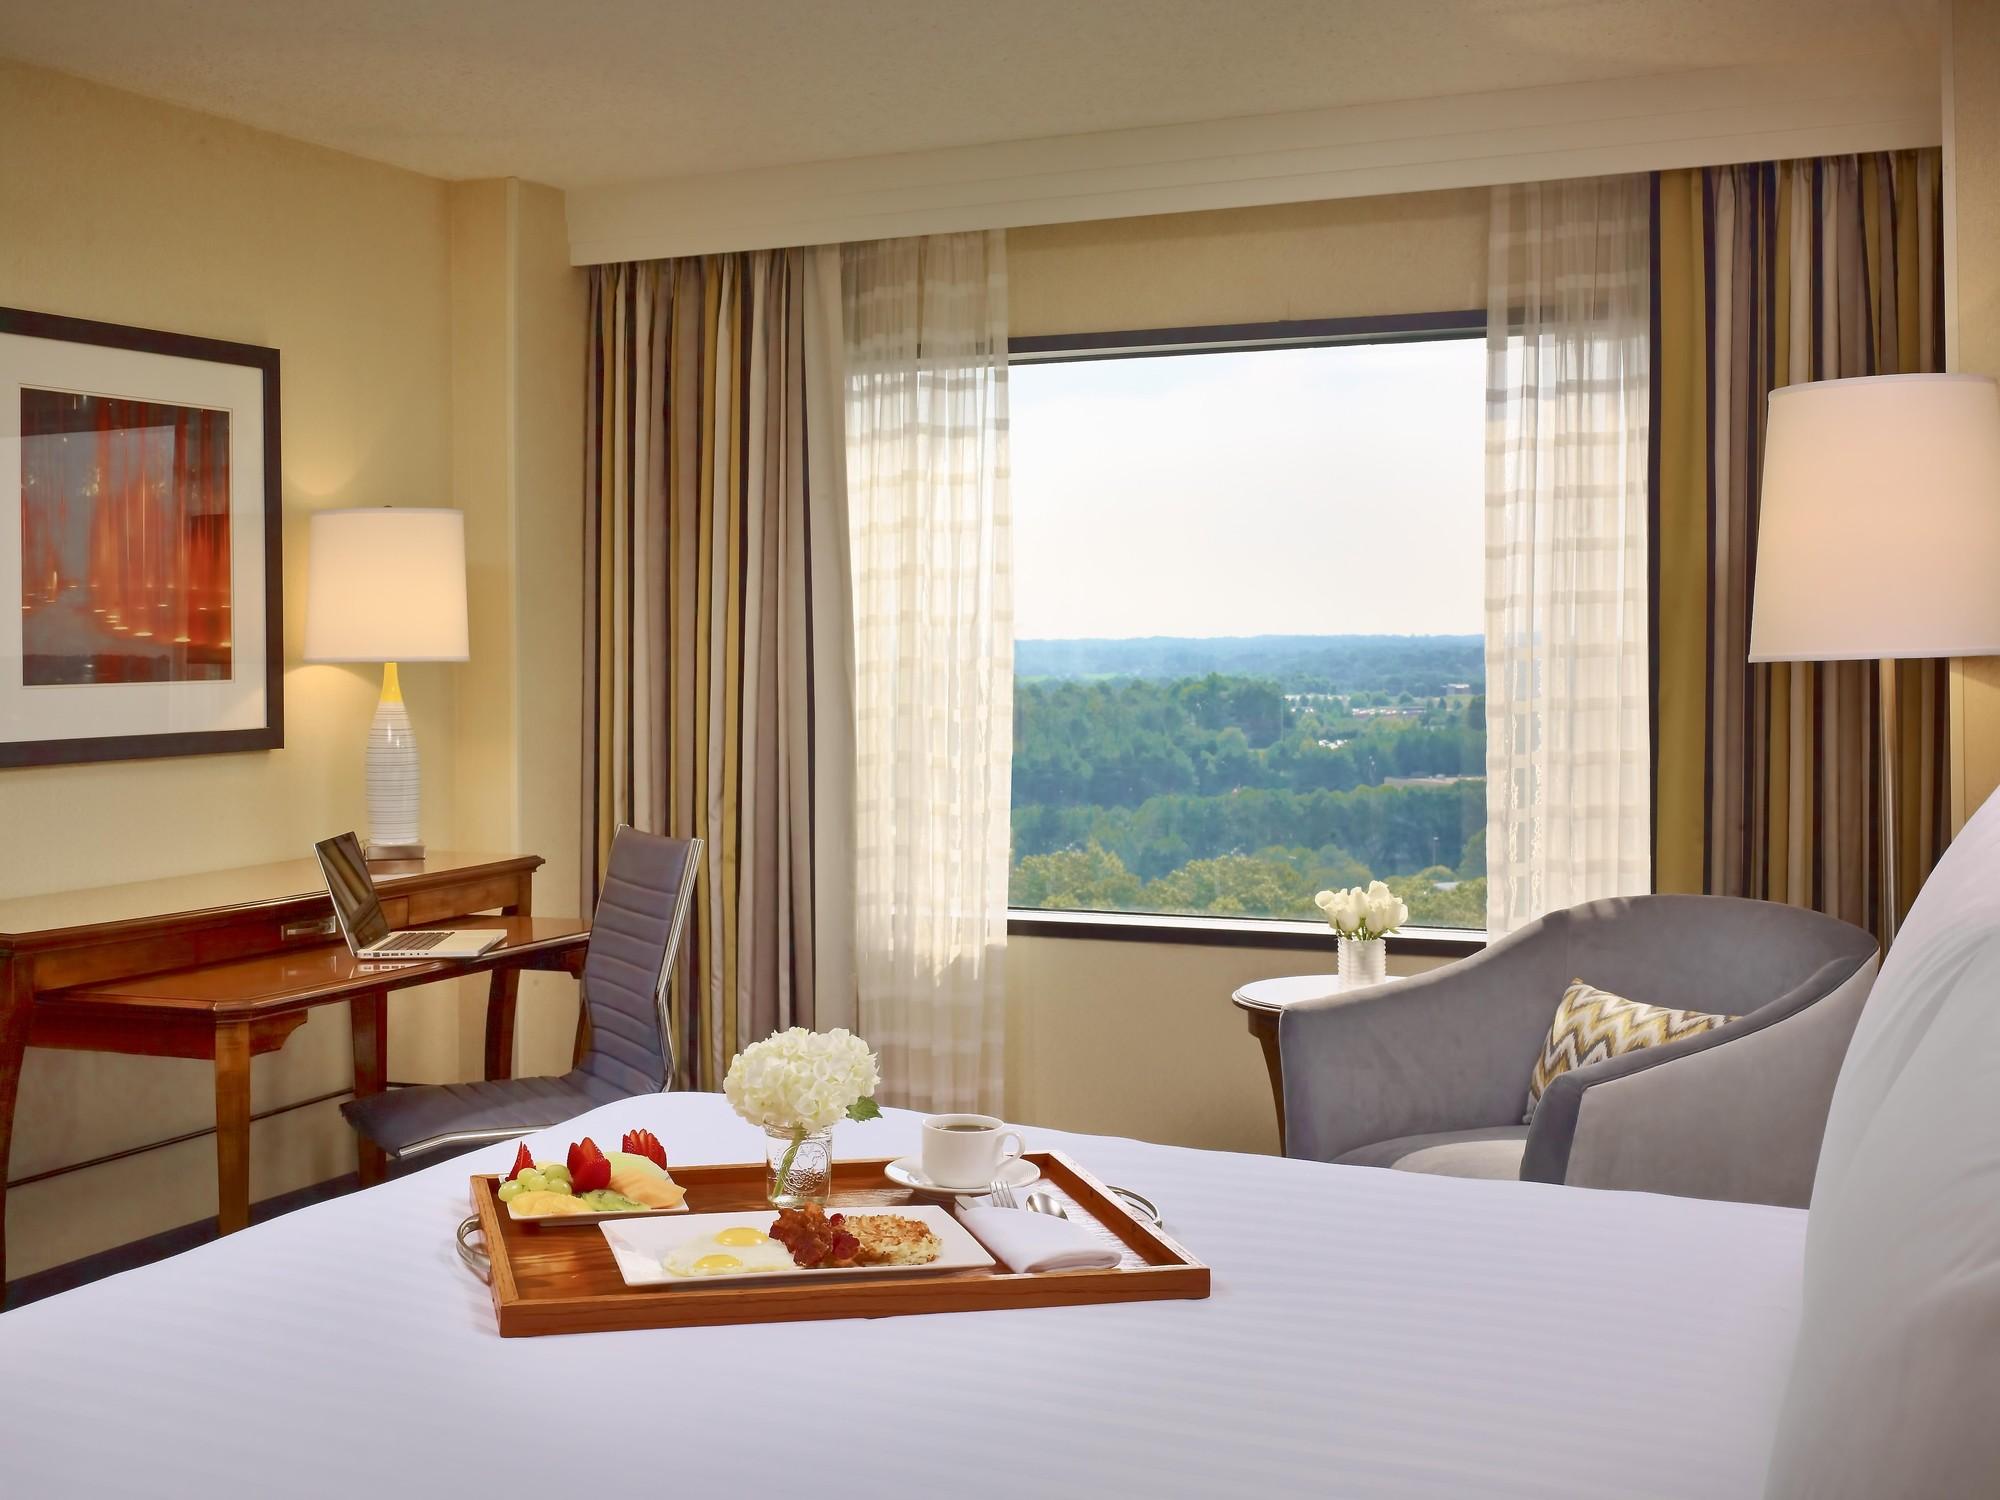 Sonesta Gwinnett Place Atlanta Preferred Guest Room